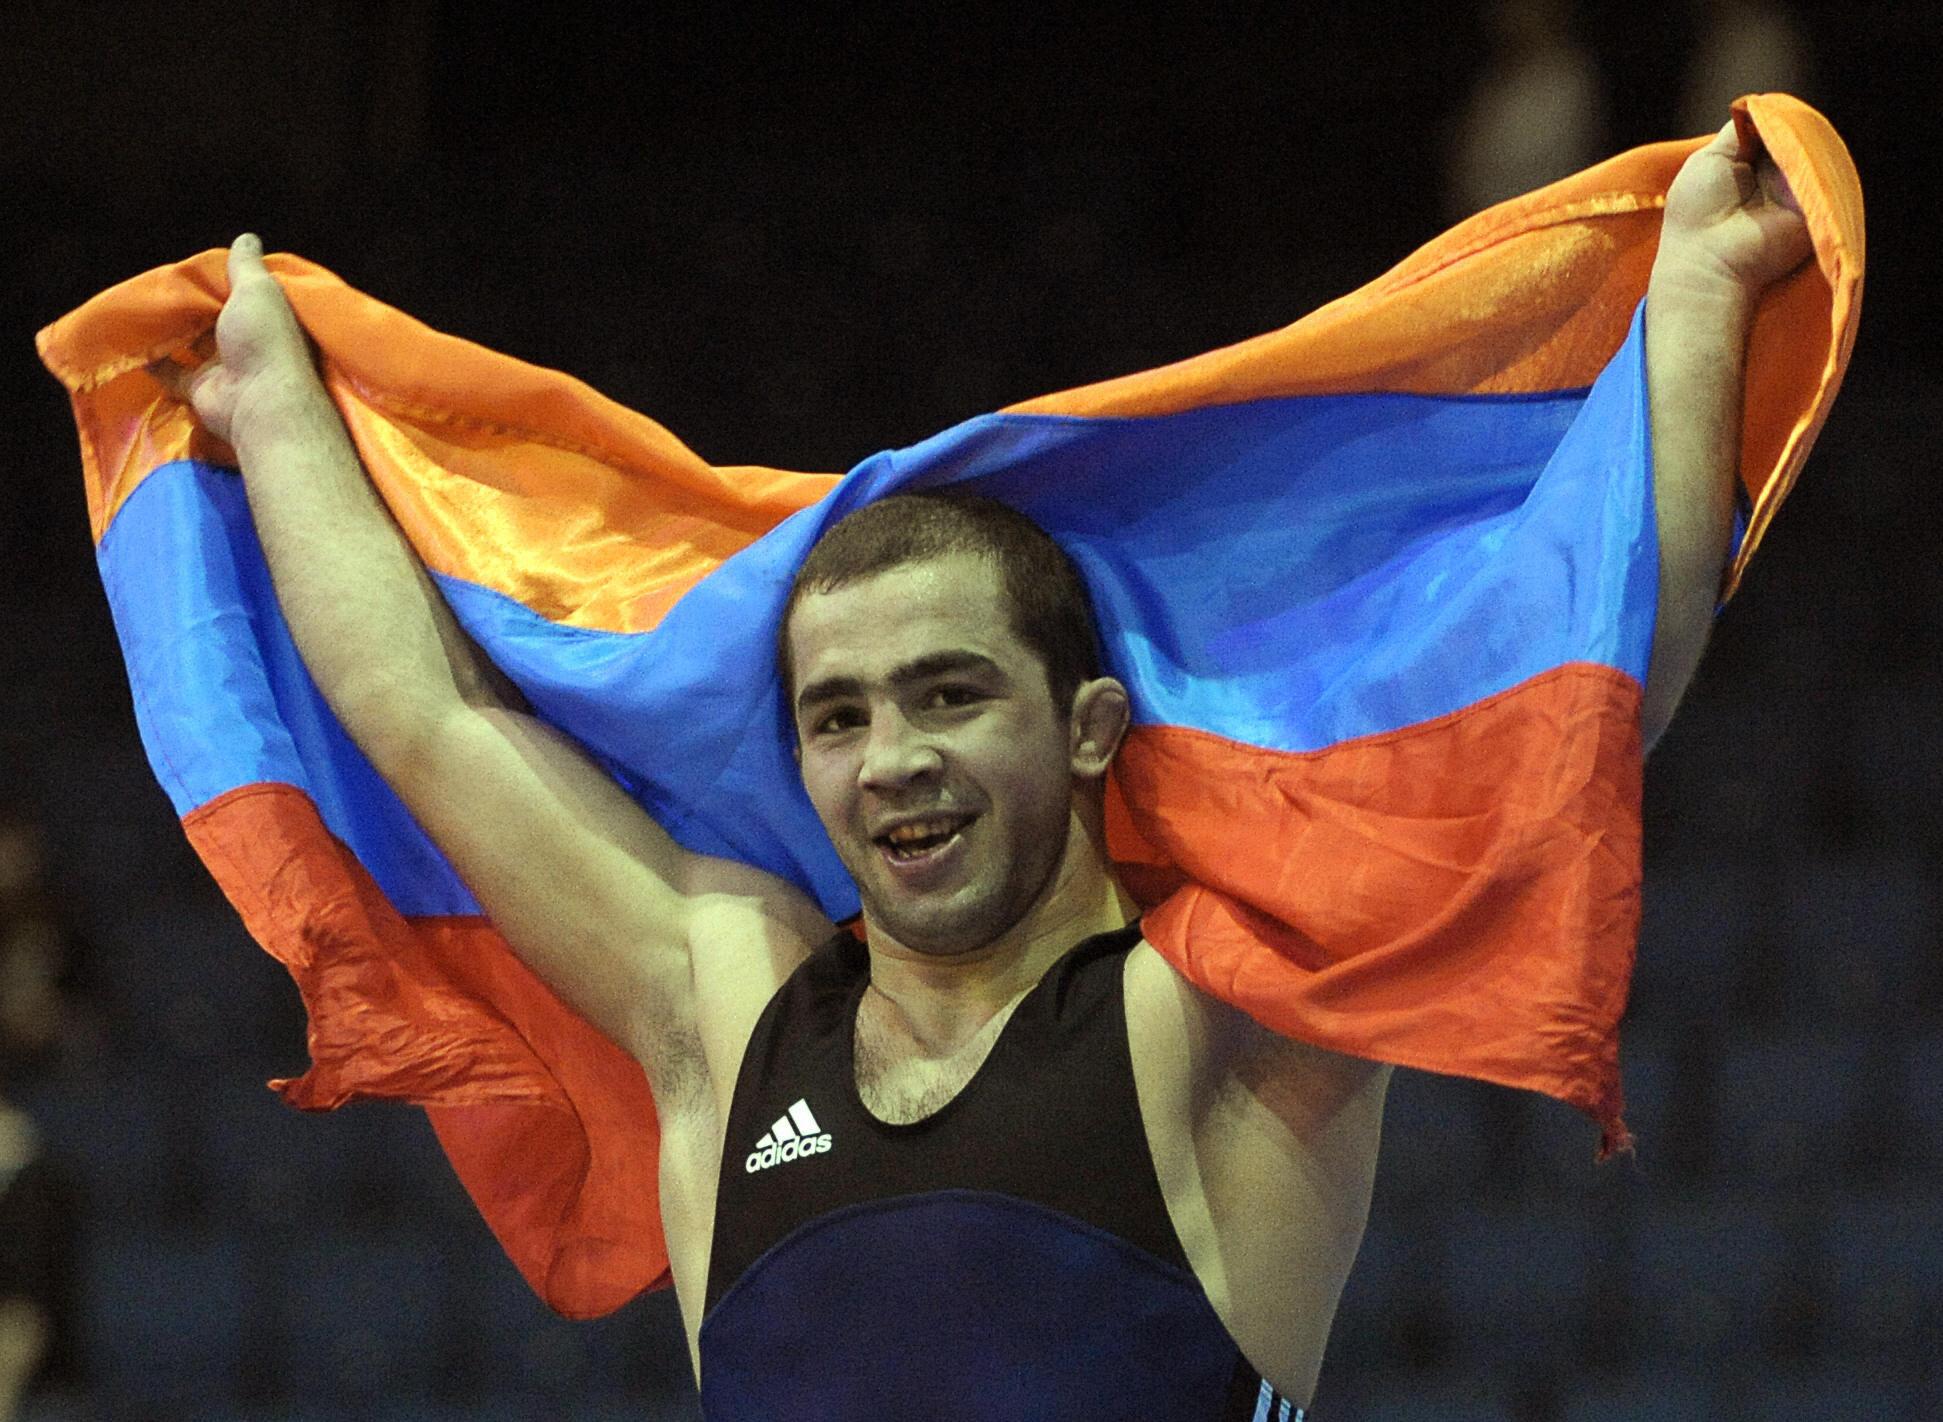 Julfalakyan named as chairman of United World Wrestling Athletes' Commission